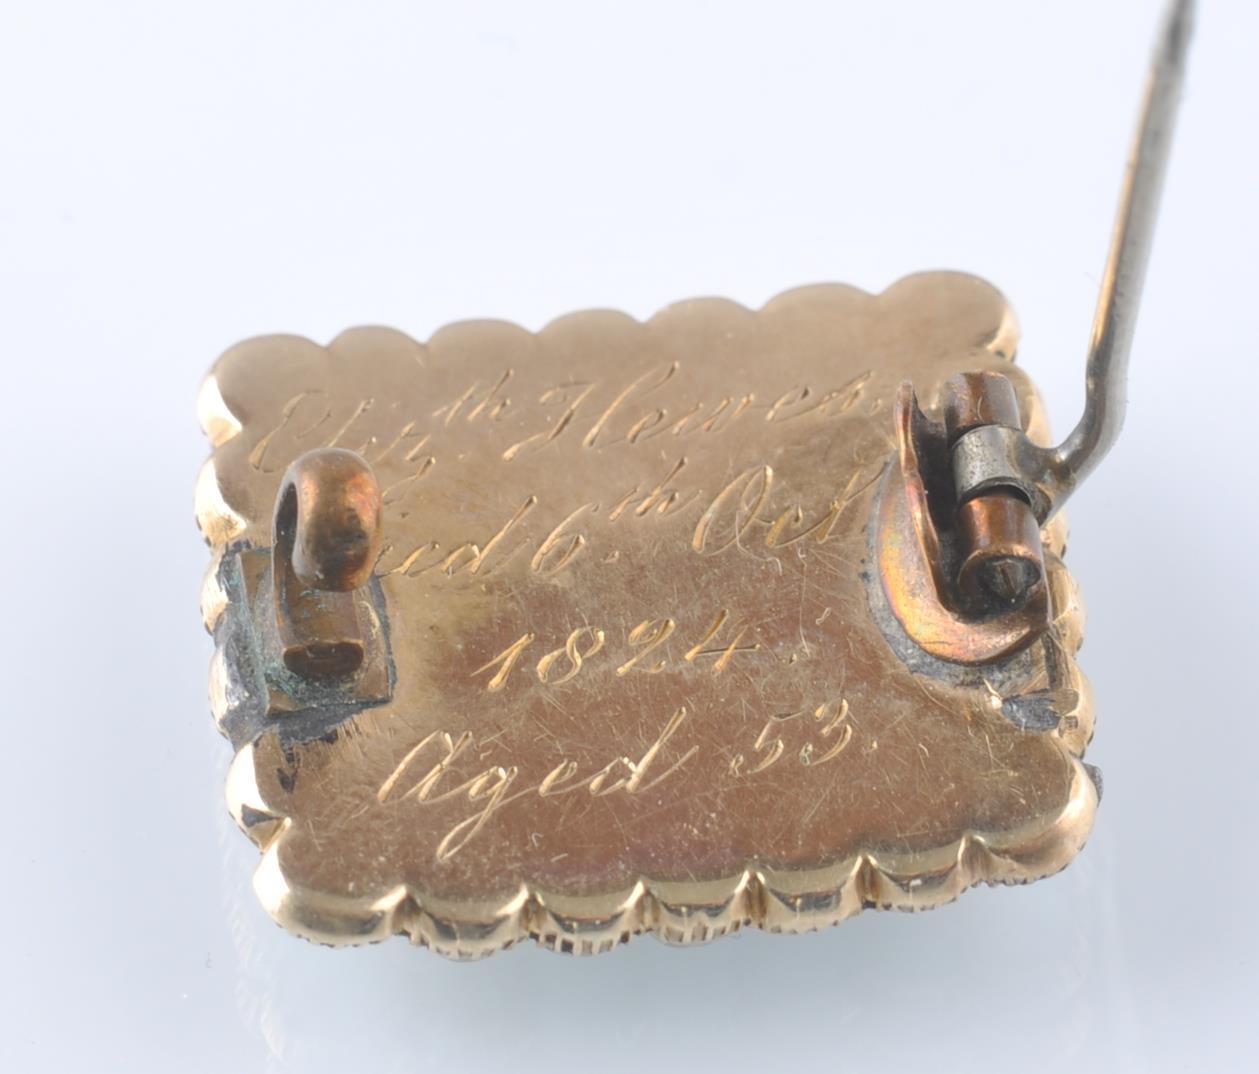 Lot 69 - 1824 GEORGE IV GOLD AND SEED PEARL WINDOW LOCKET B